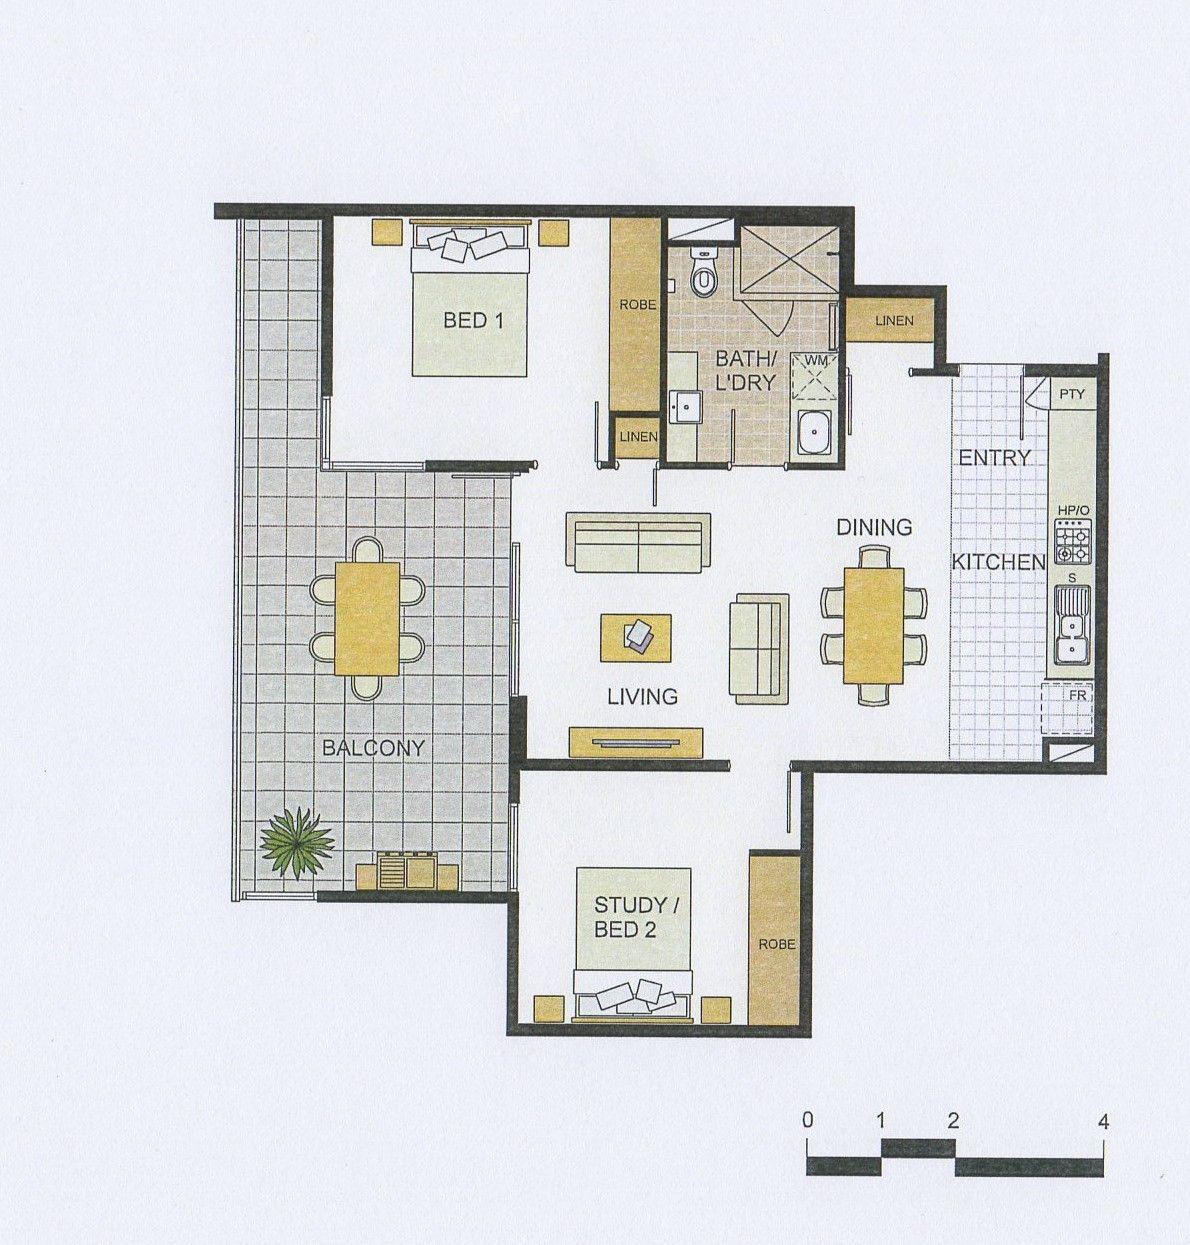 Baystone Apartments: Level 5/501/25 Malata Crescent